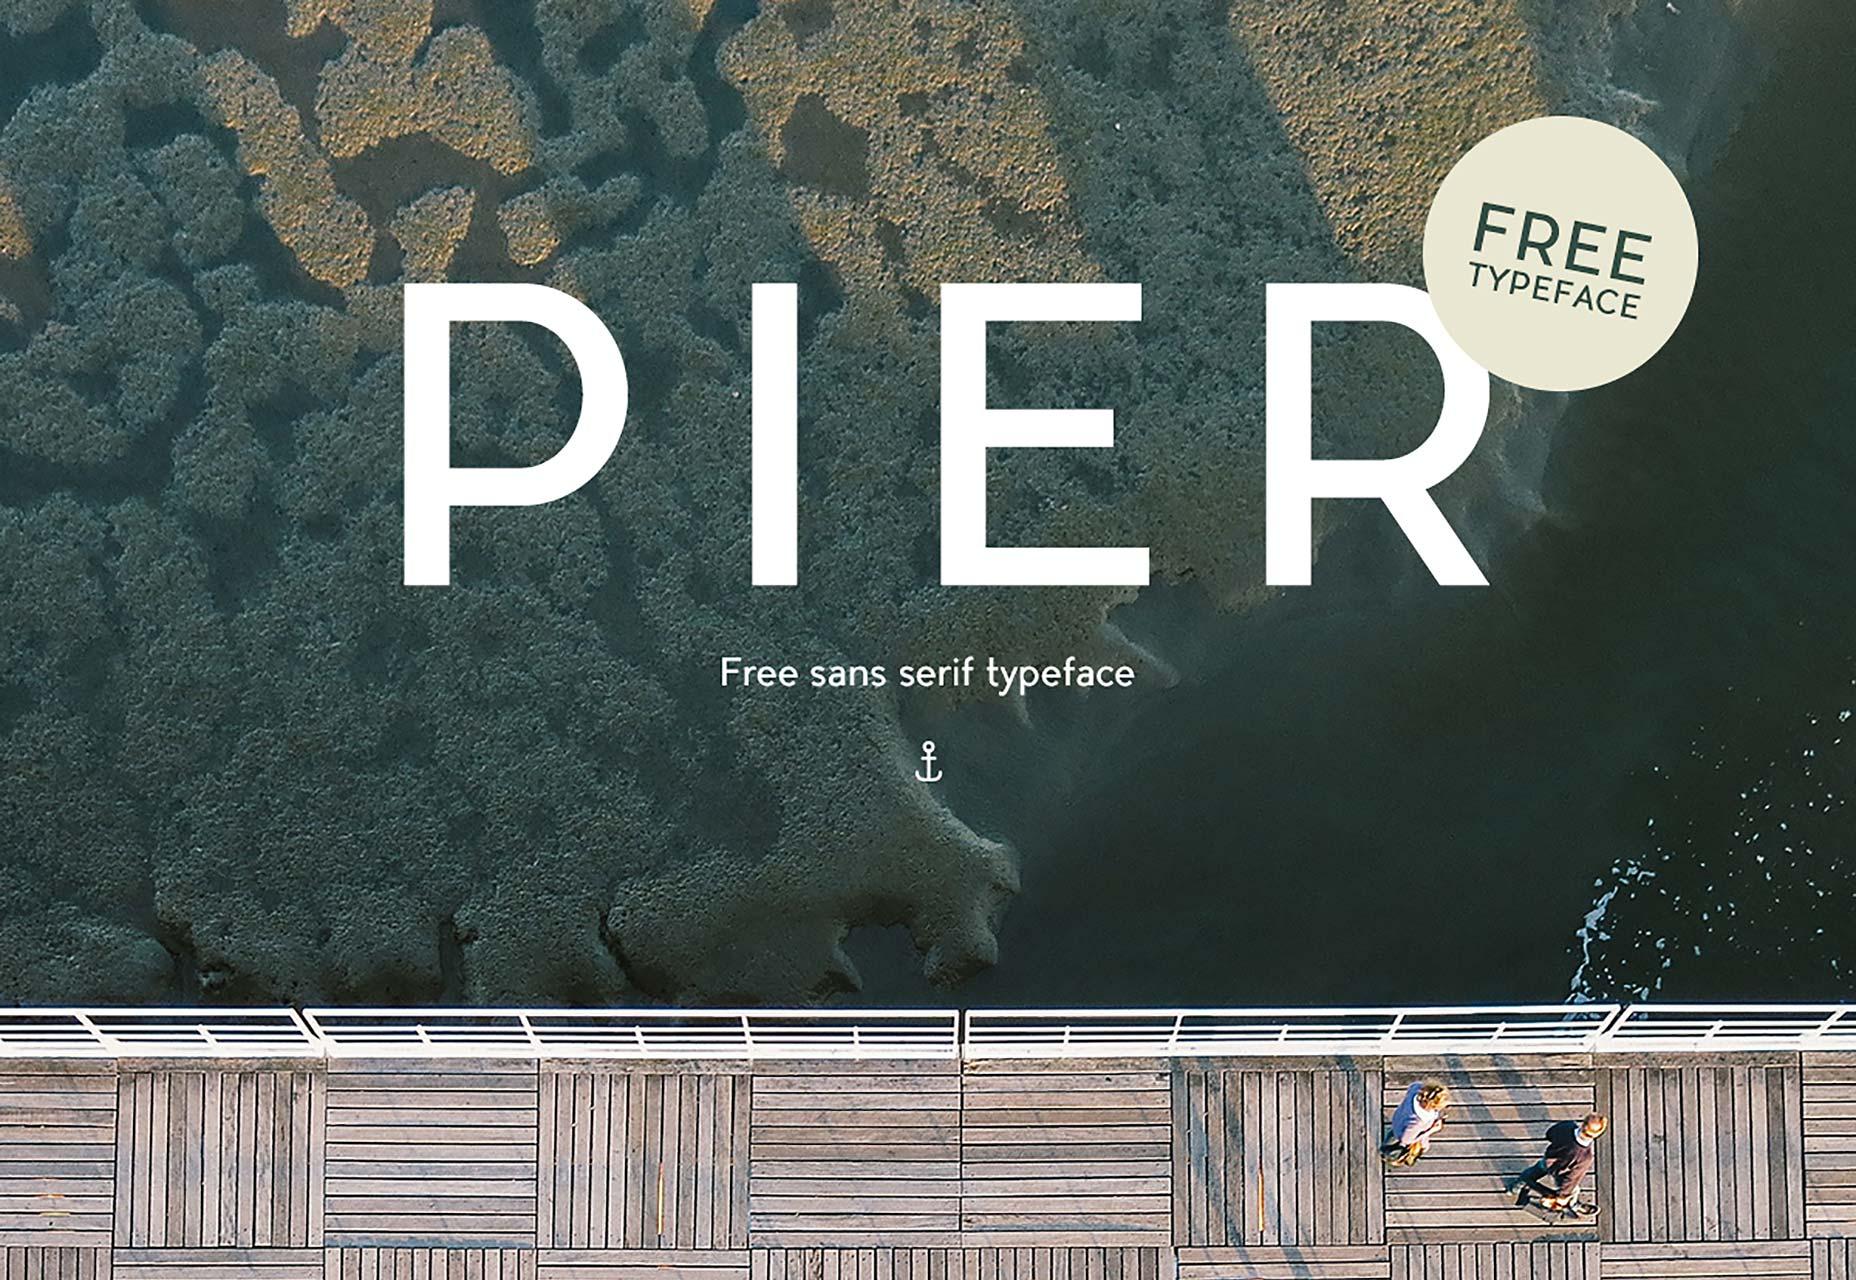 018_pier